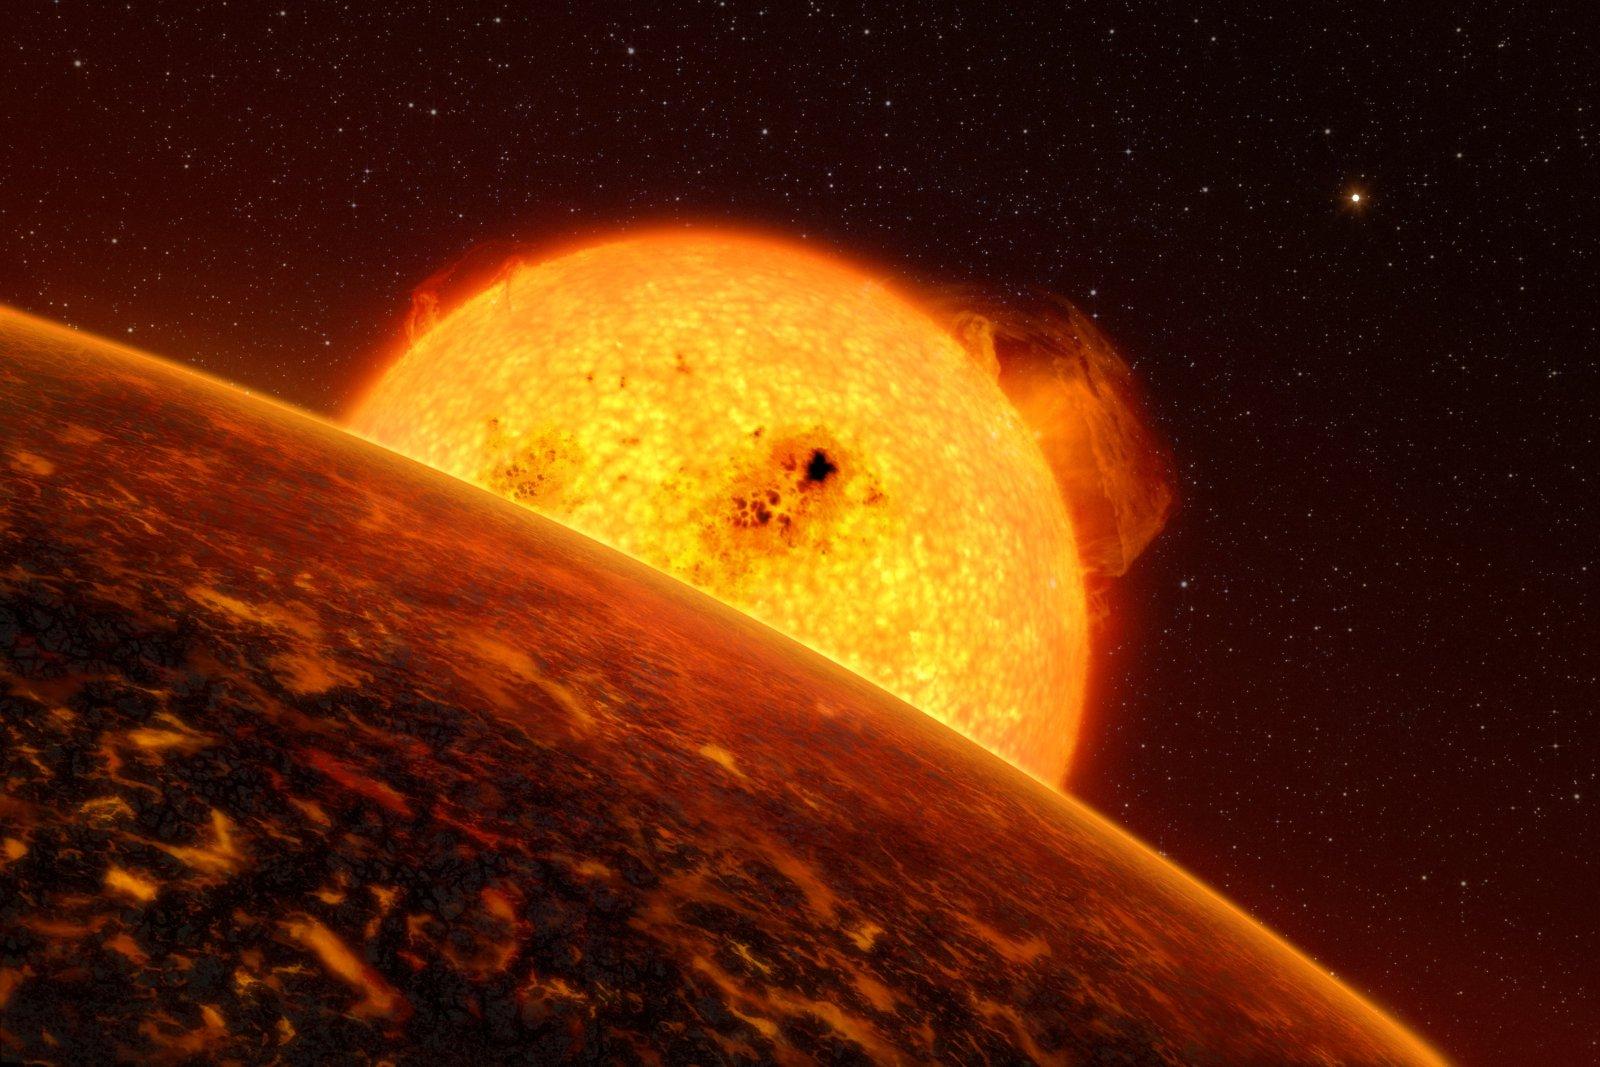 http://antwrp.gsfc.nasa.gov/apod/image/0909/corot7b_eso_big.jpg